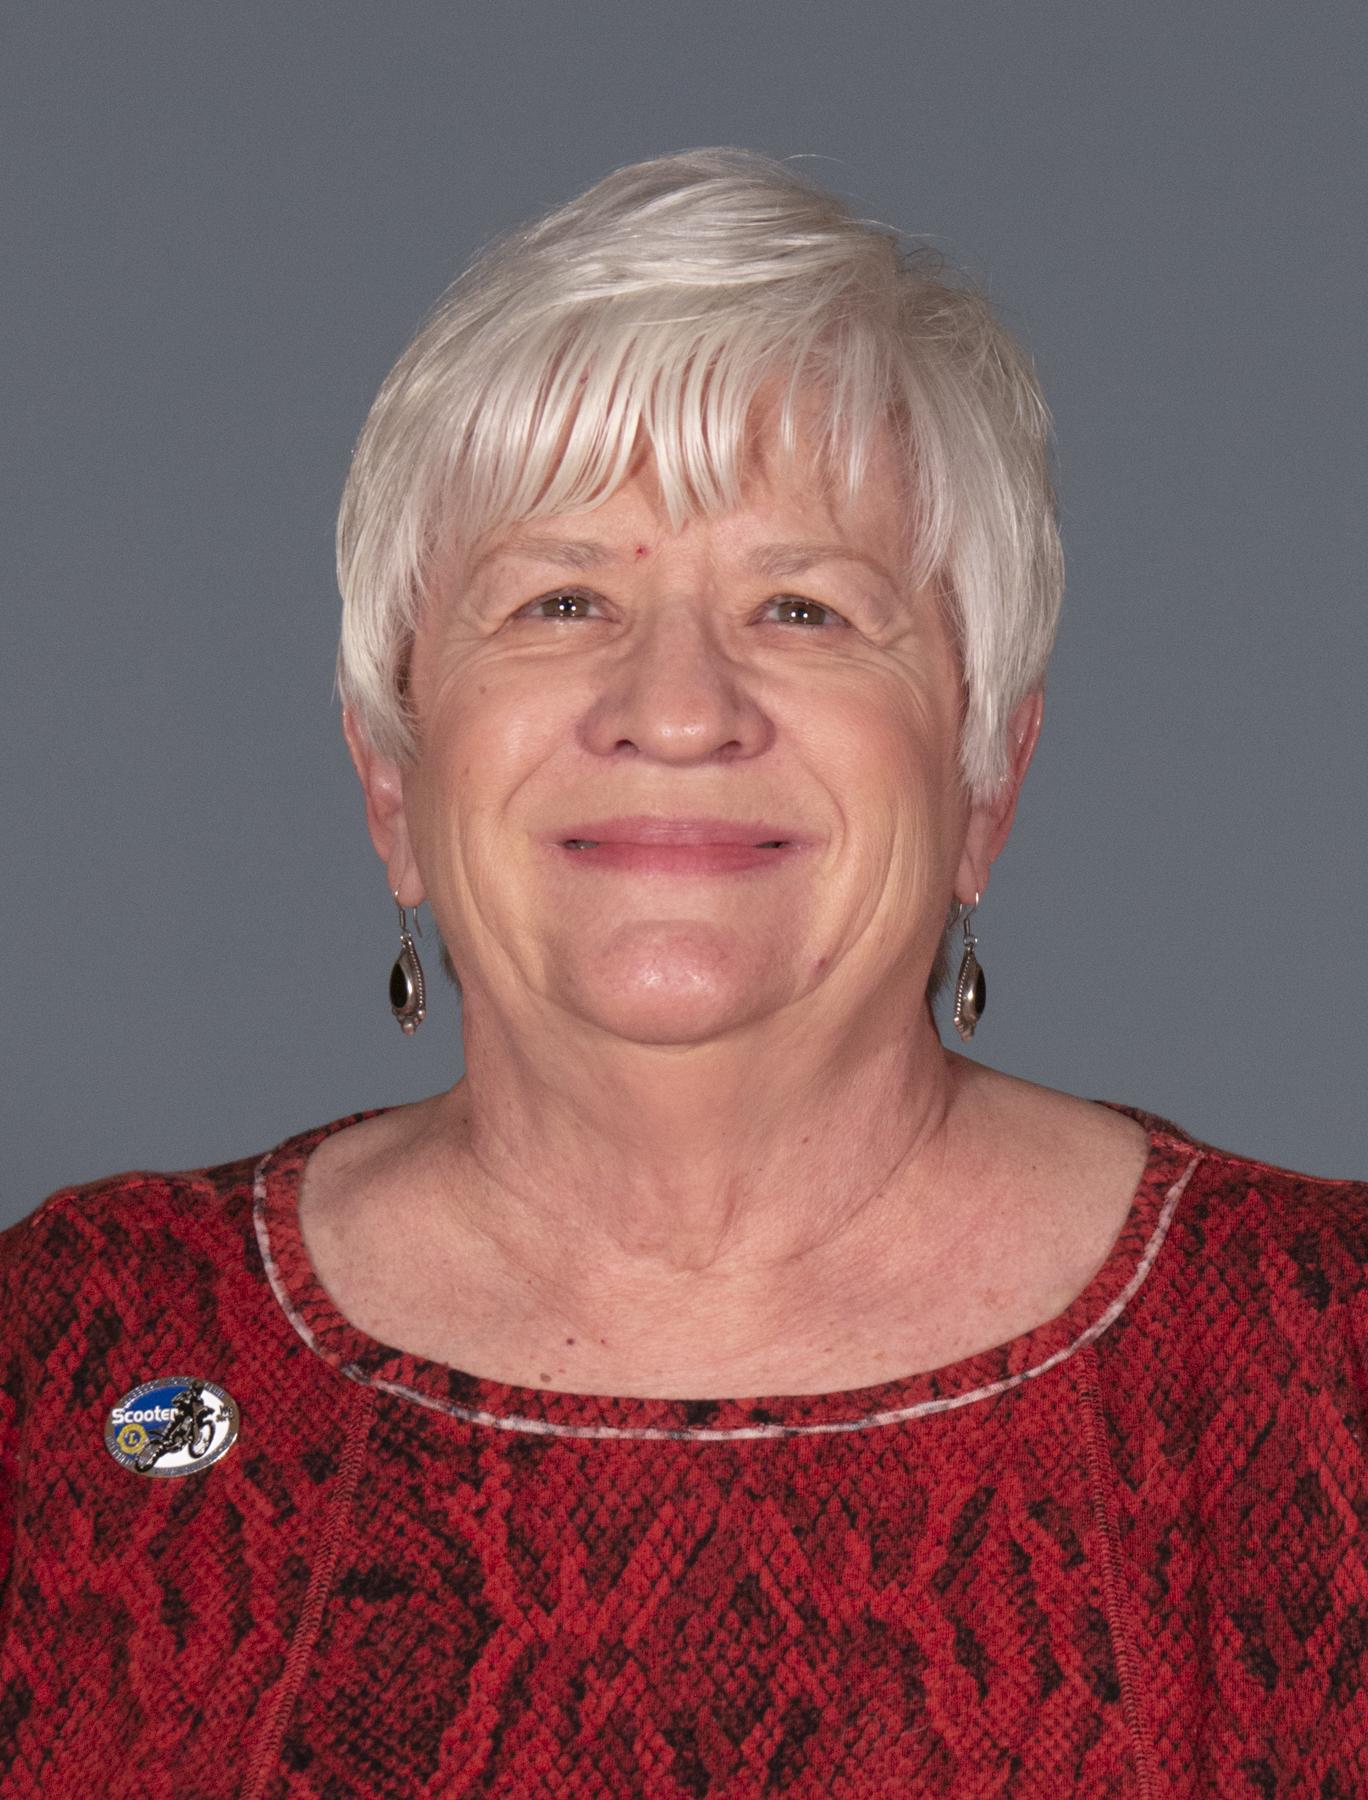 Judy Darby